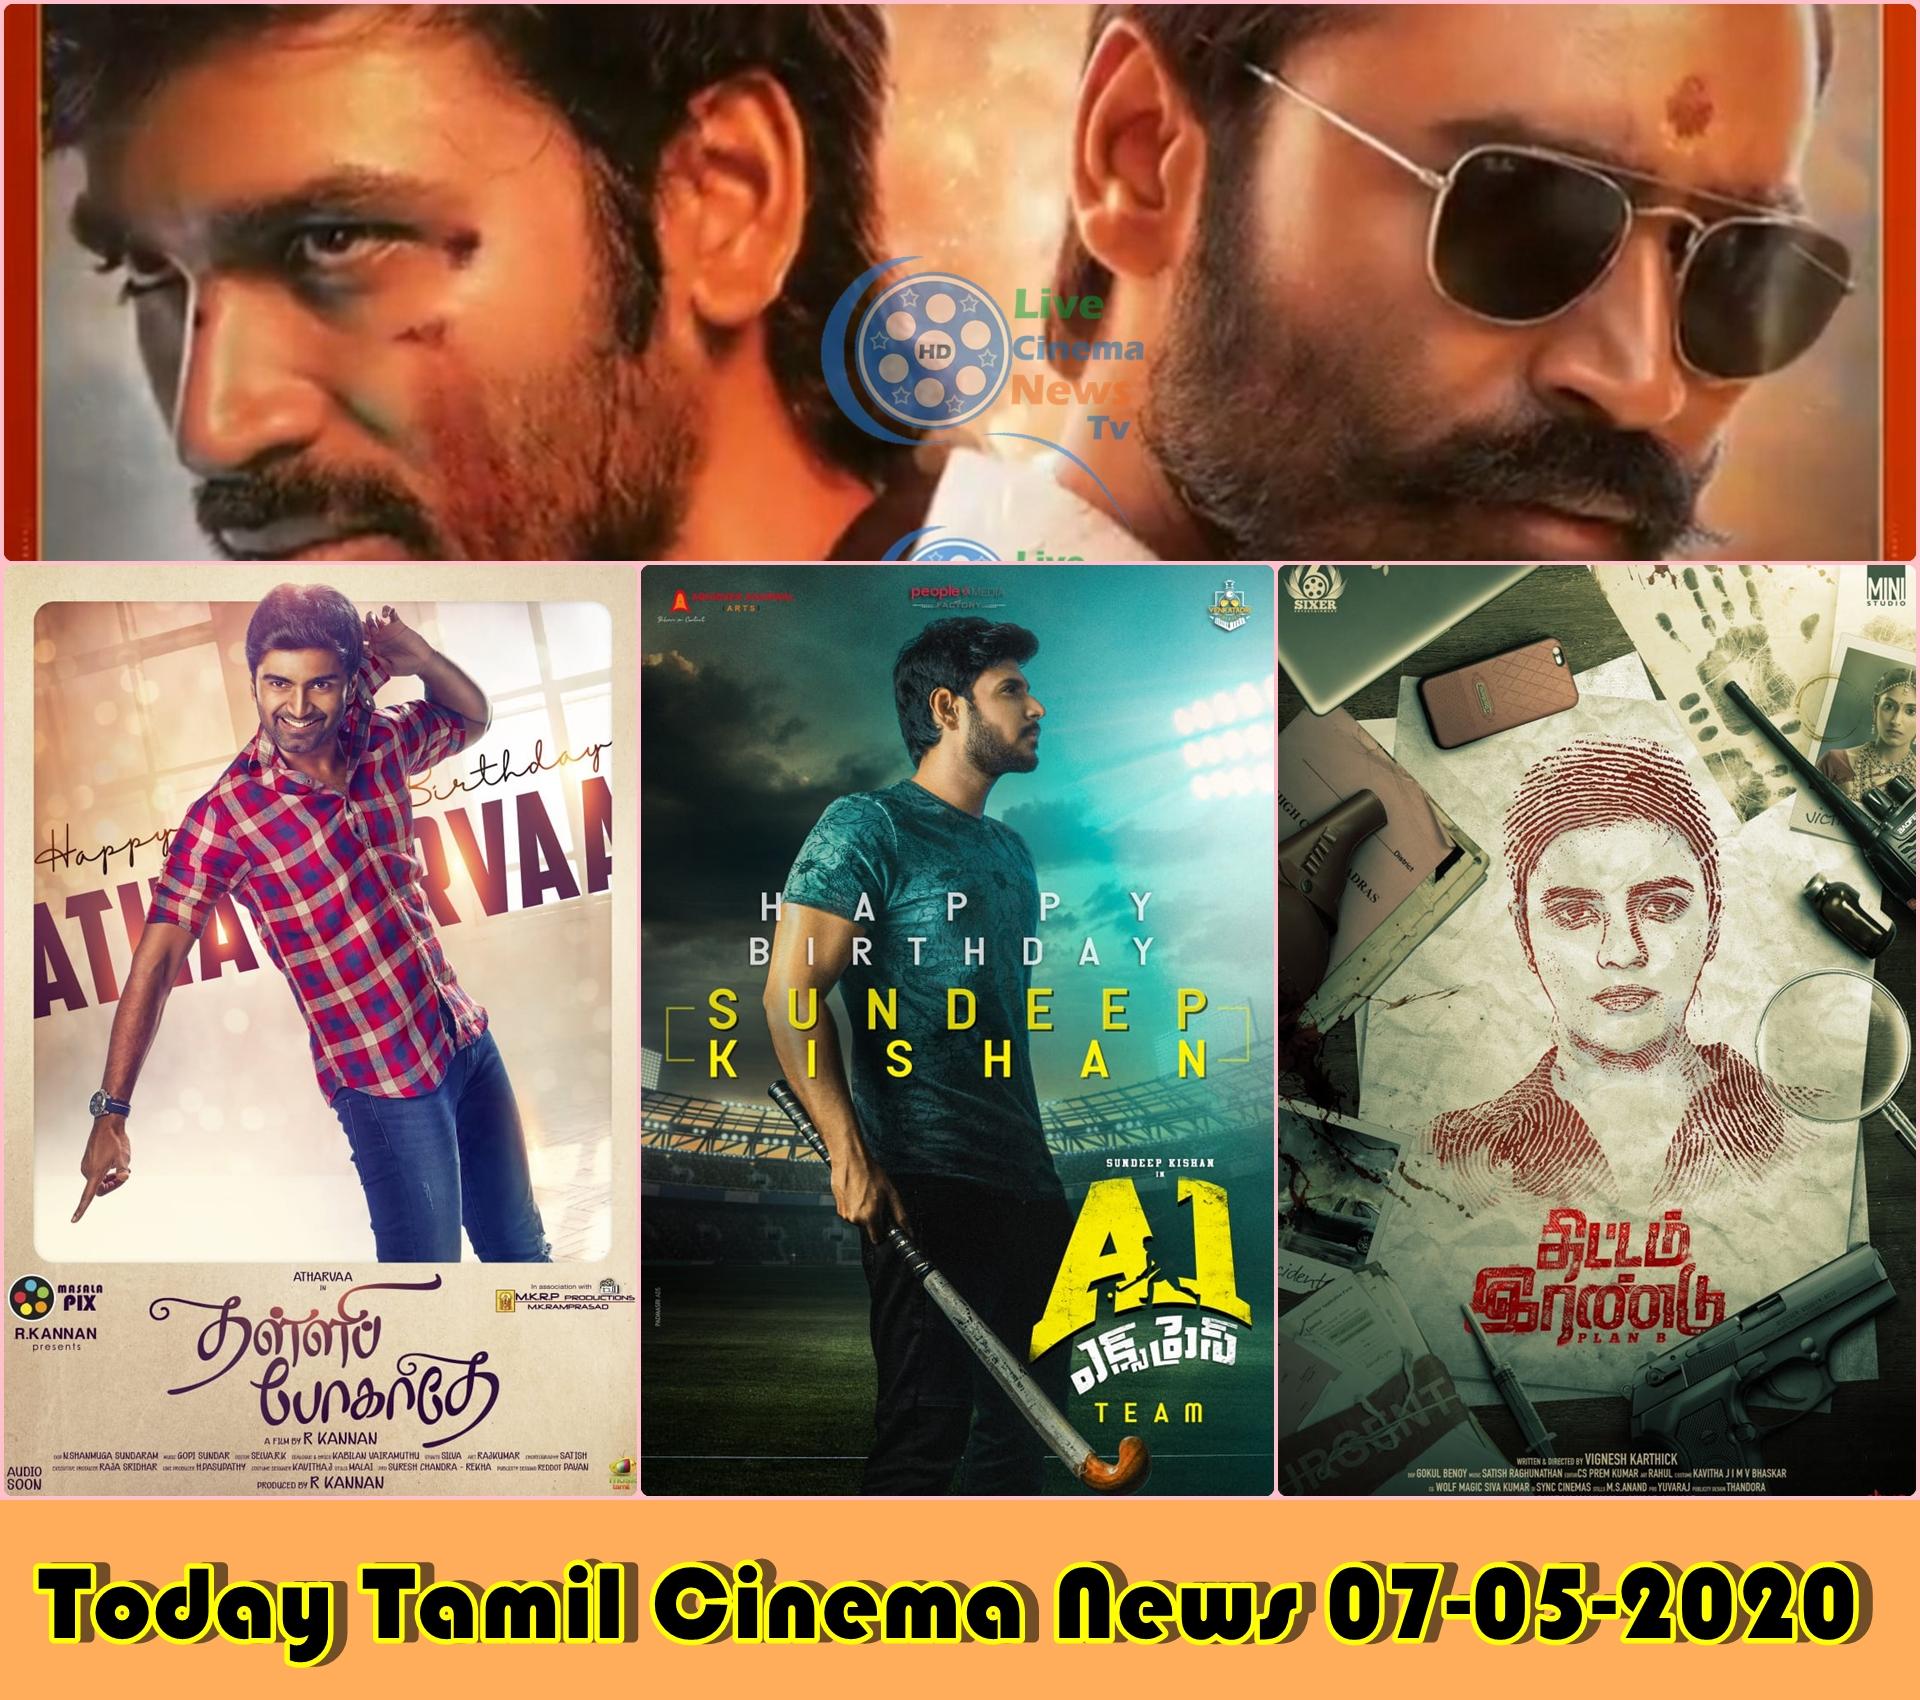 Today Tamil Cinema News 07-05-2020